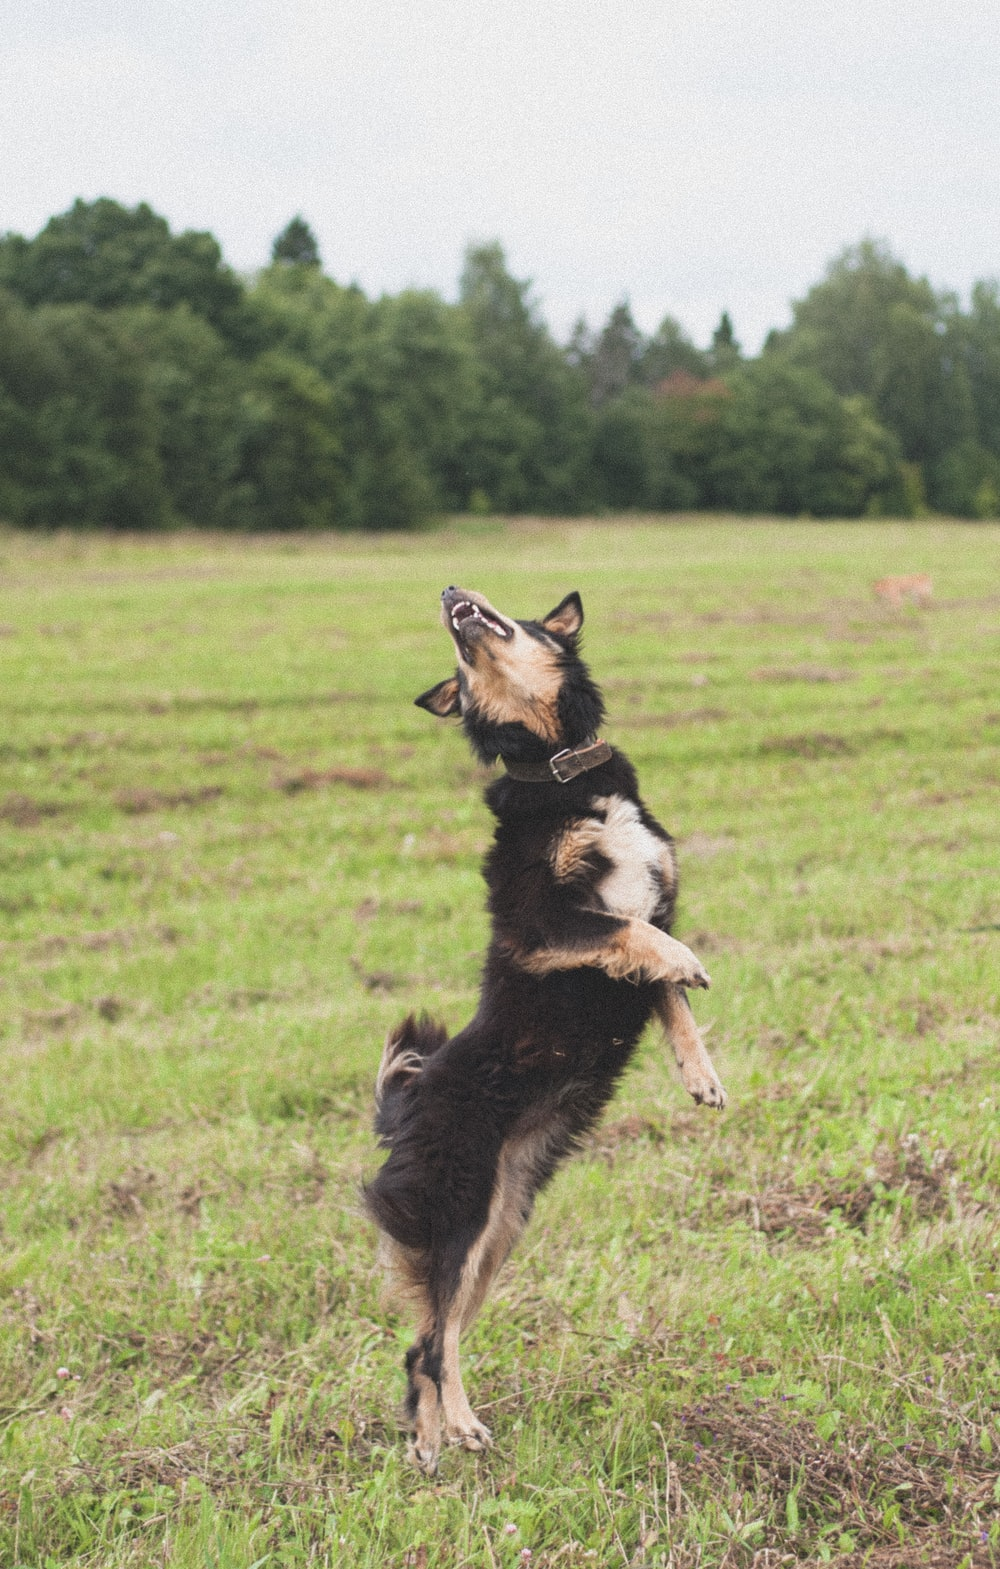 short-coated black and tan dog close-up photography